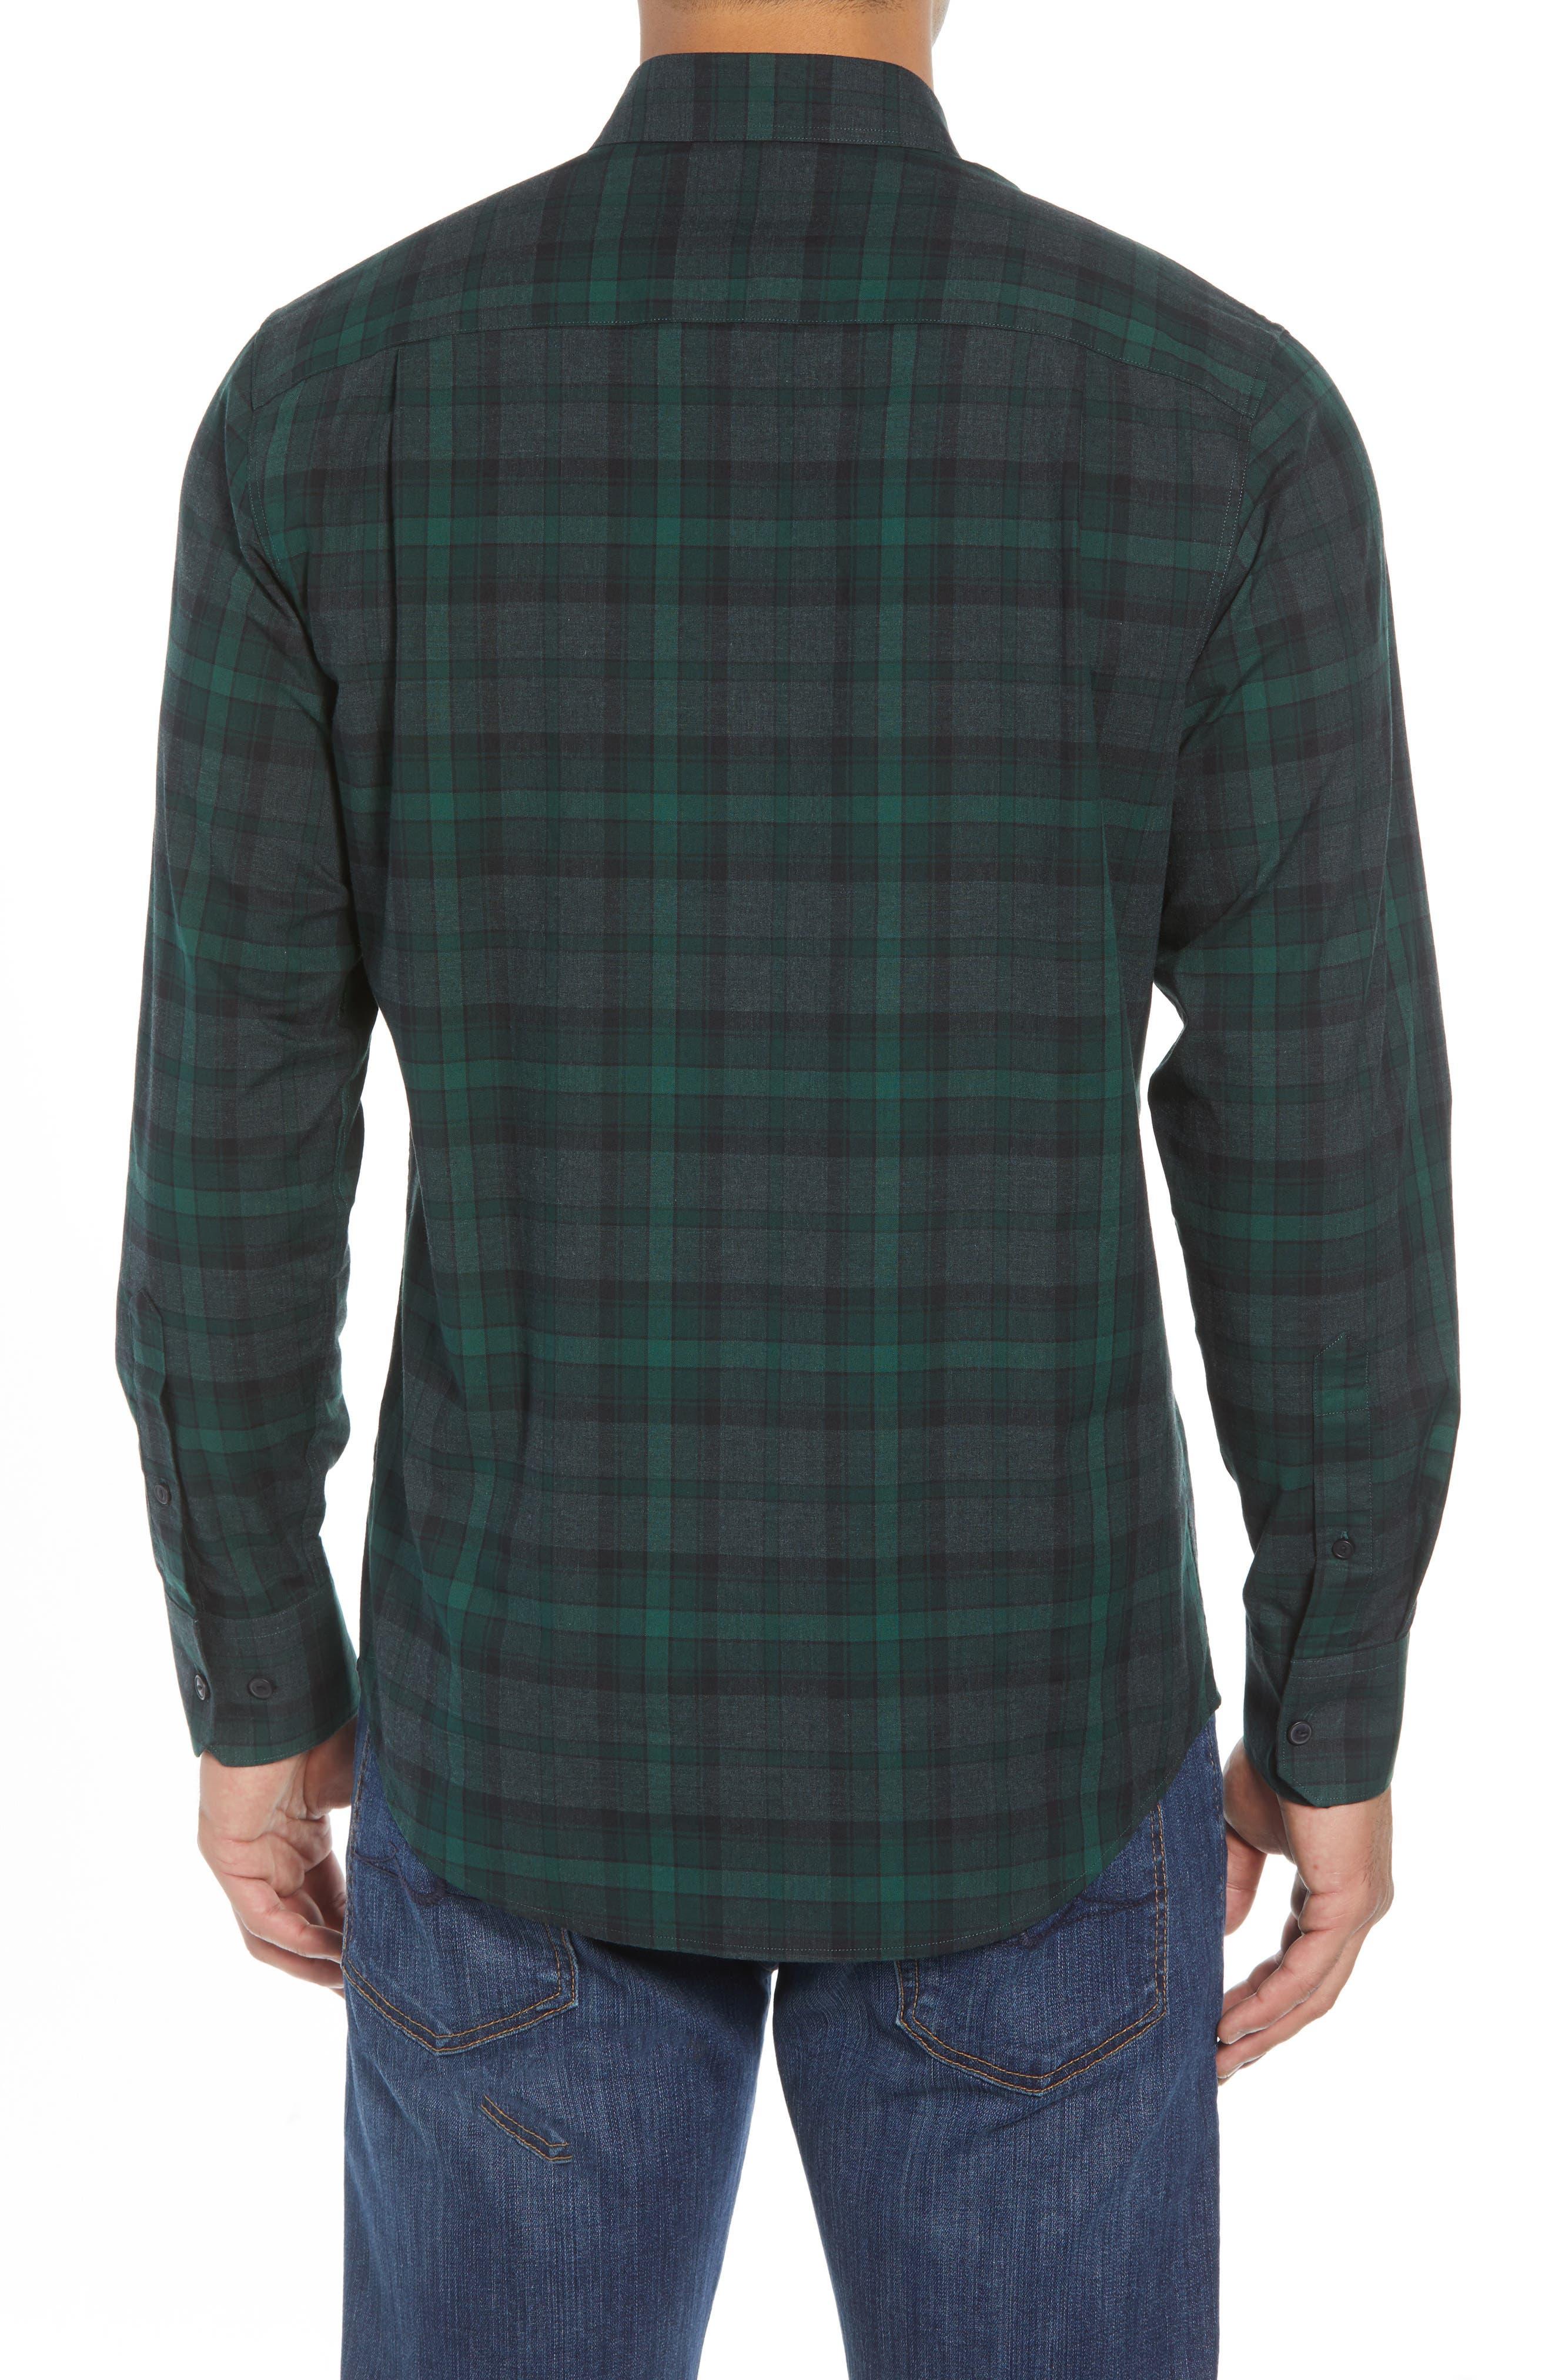 Regular Fit Plaid Flannel Sport Shirt,                             Alternate thumbnail 2, color,                             GREEN FOREST GREY PLAID